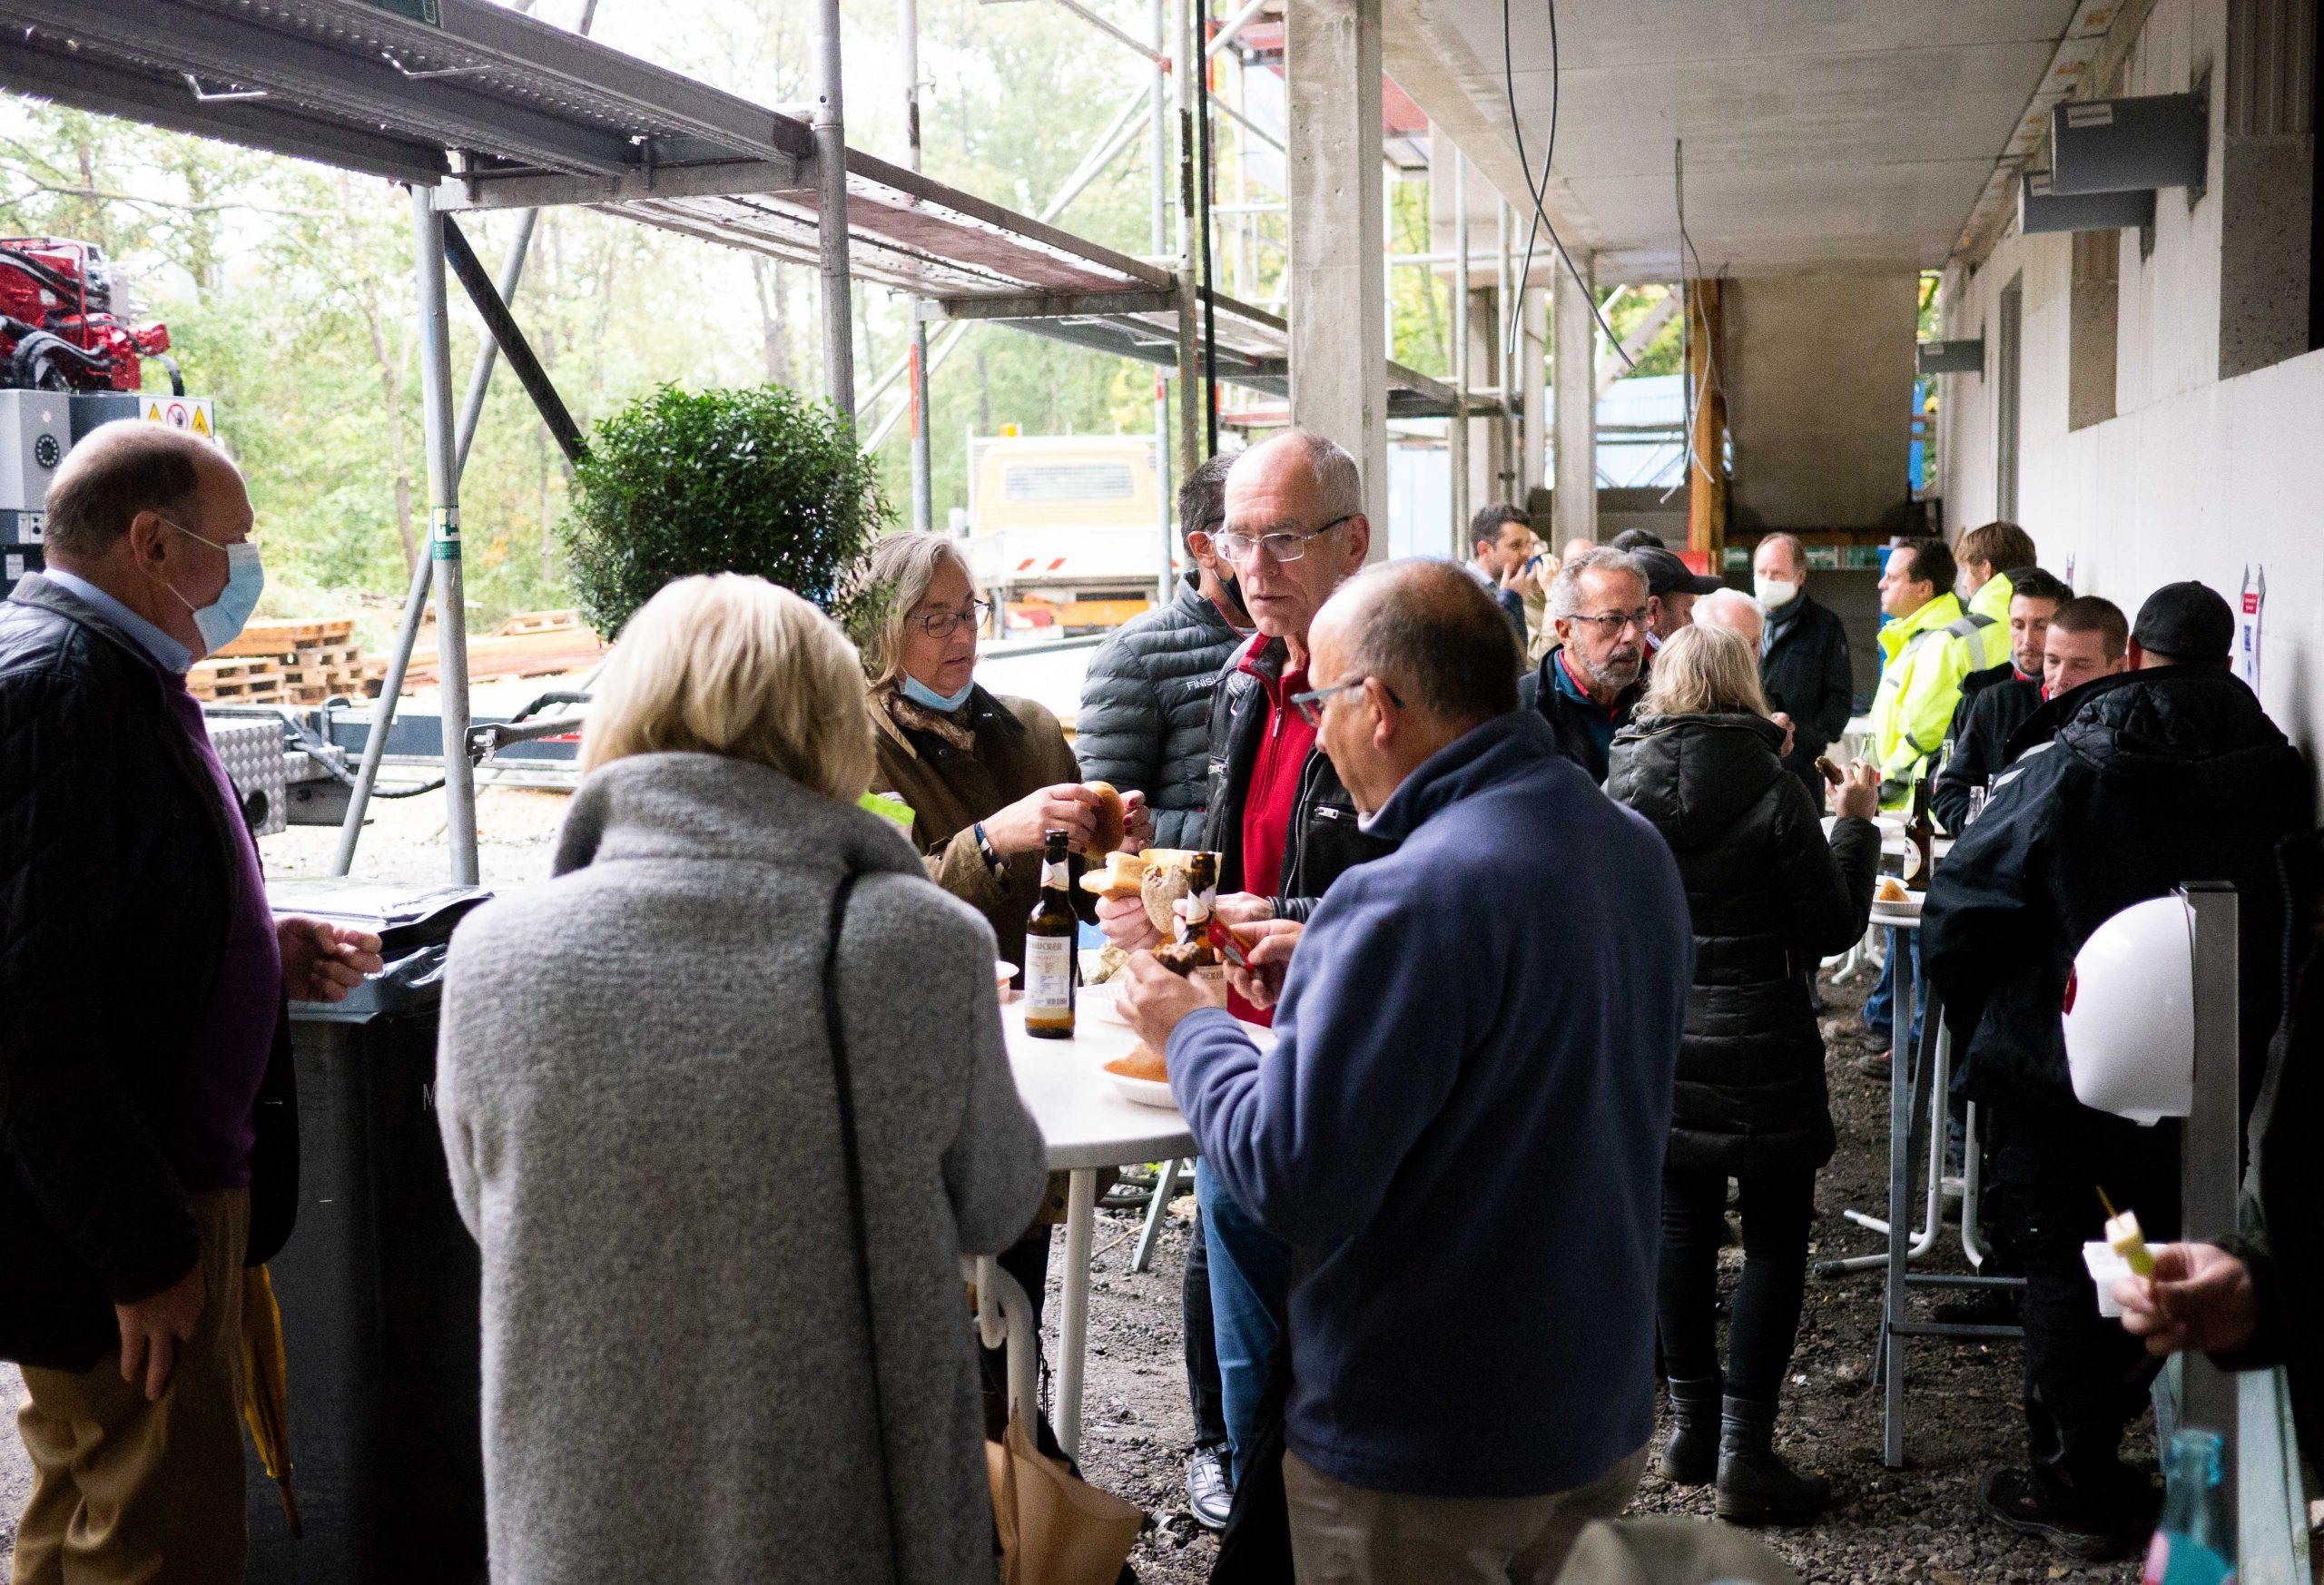 KfW Förderung Wiesbaden, Energieberatung Wiesbaden